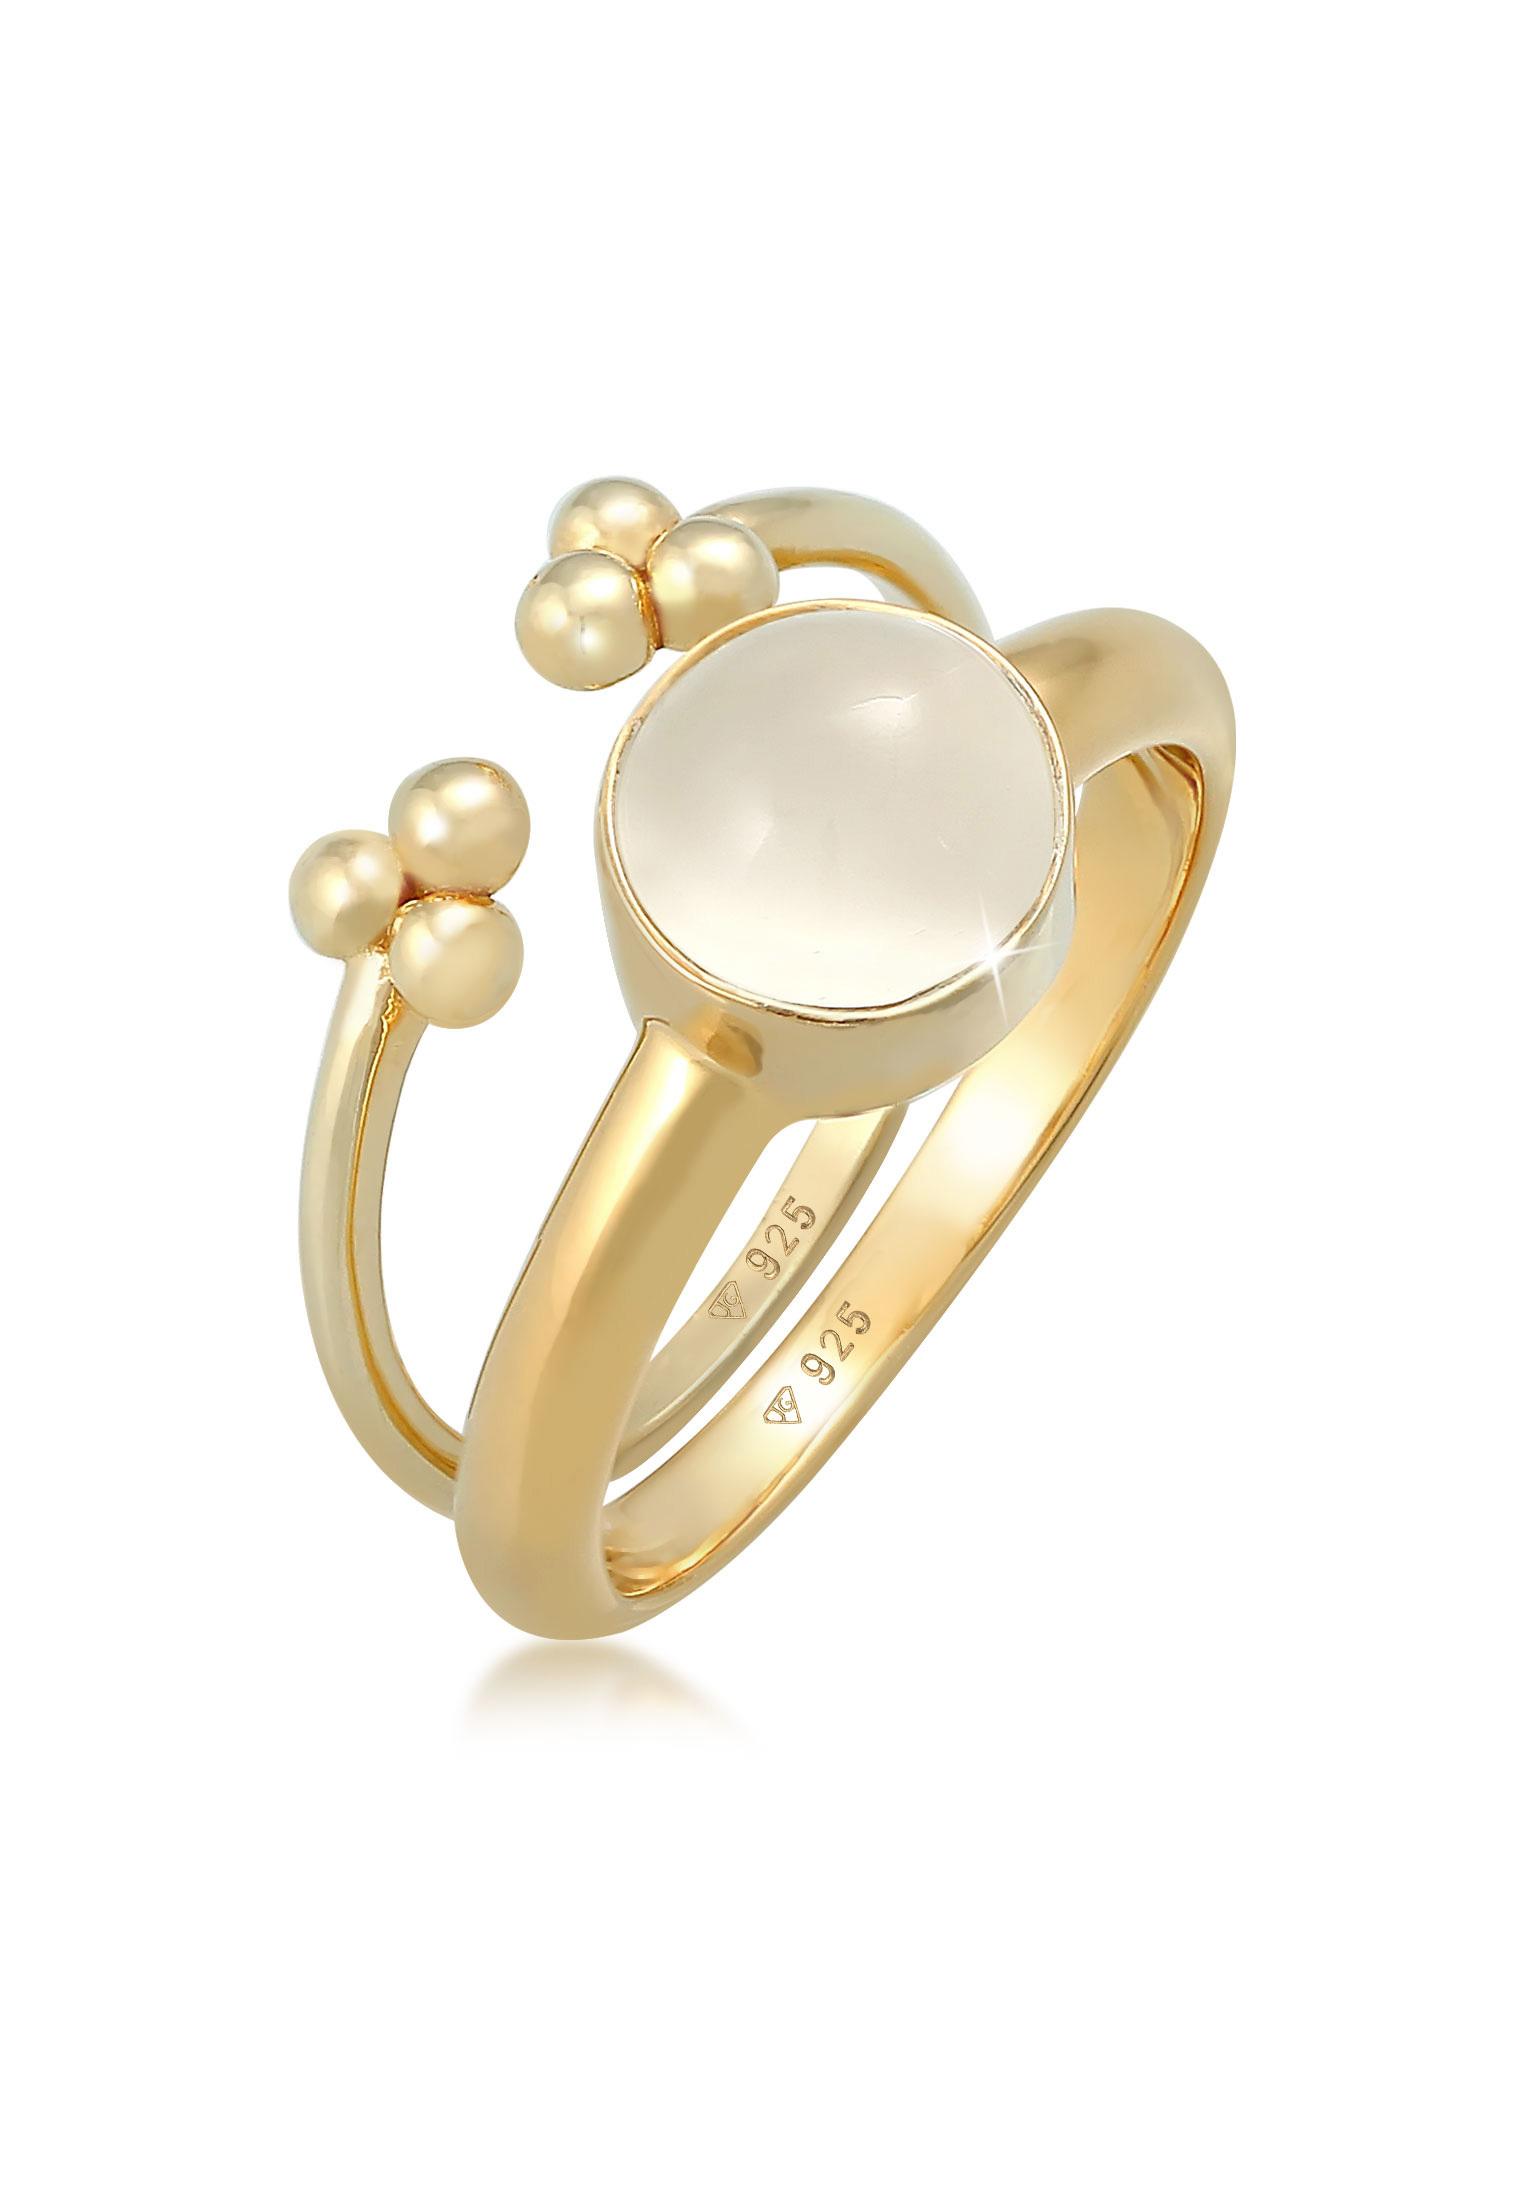 Ringset | Mondstein ( Weiß ) | 925 Sterling Silber vergoldet